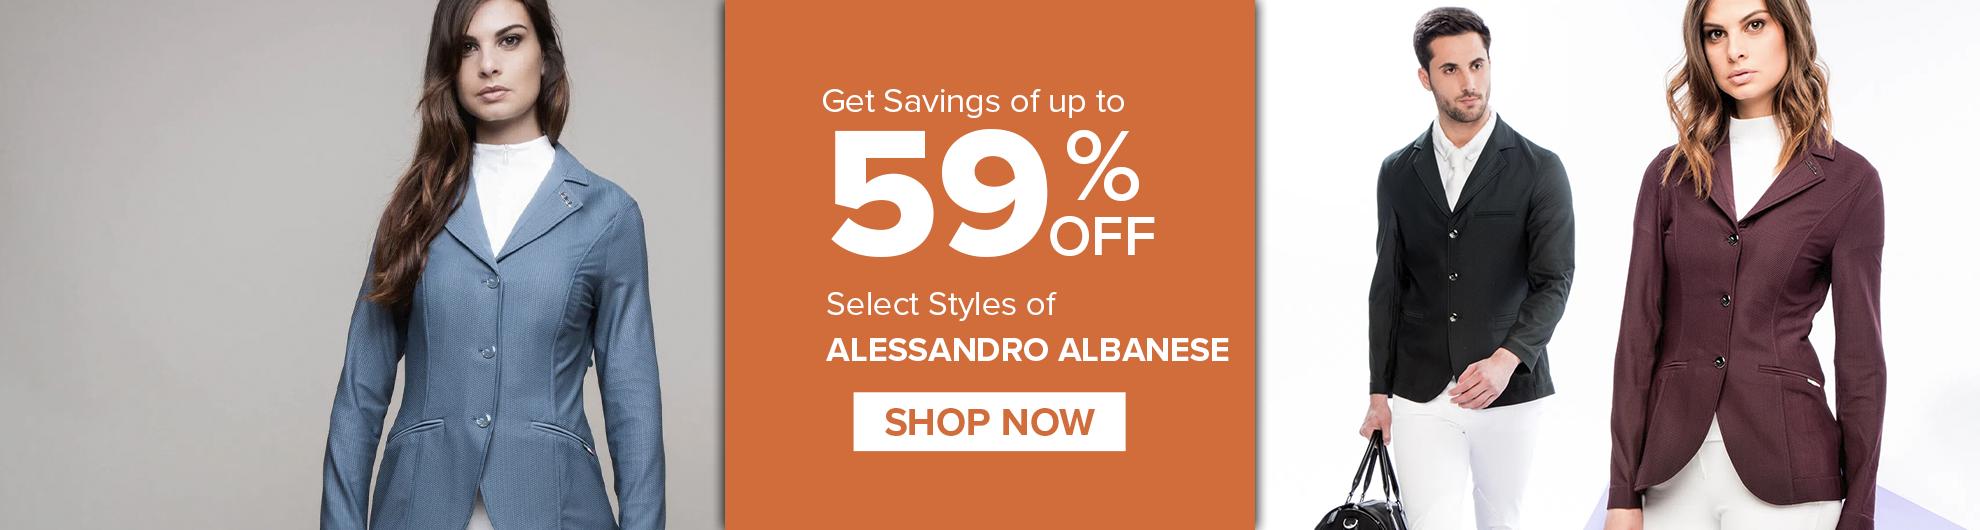 Alessandro Alabanese